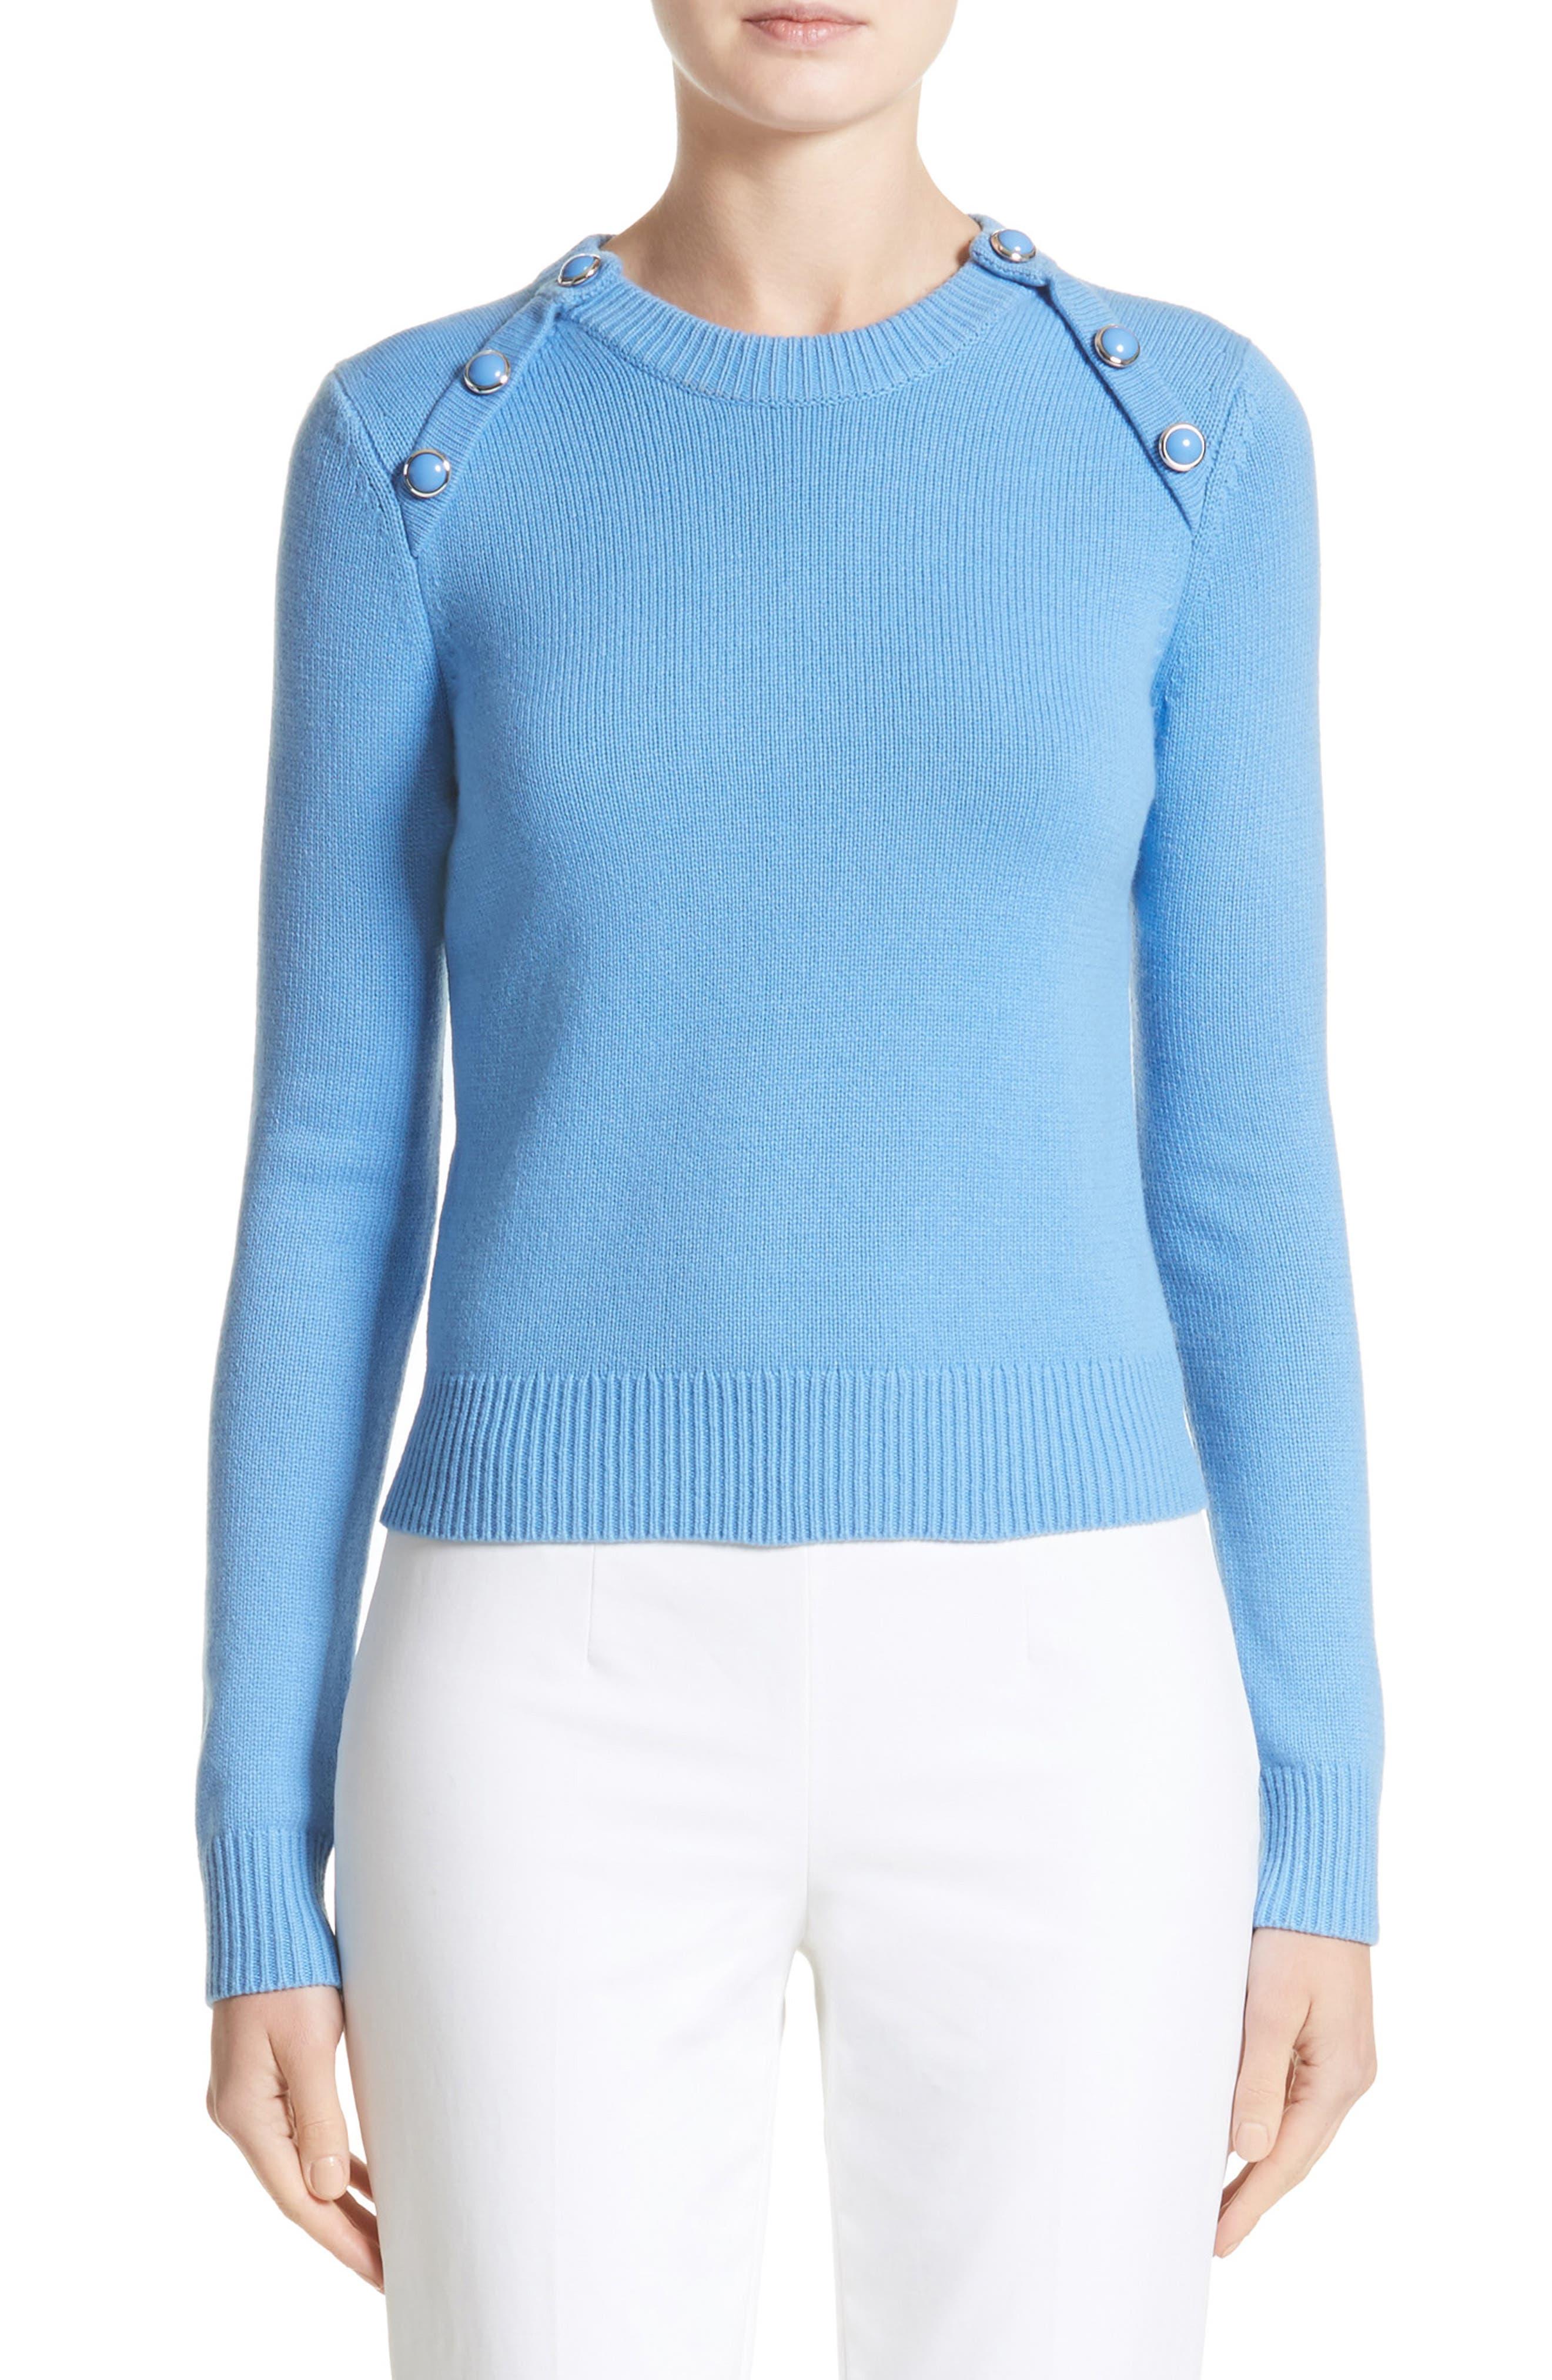 Michael Kors Raglan Cashmere Sweater